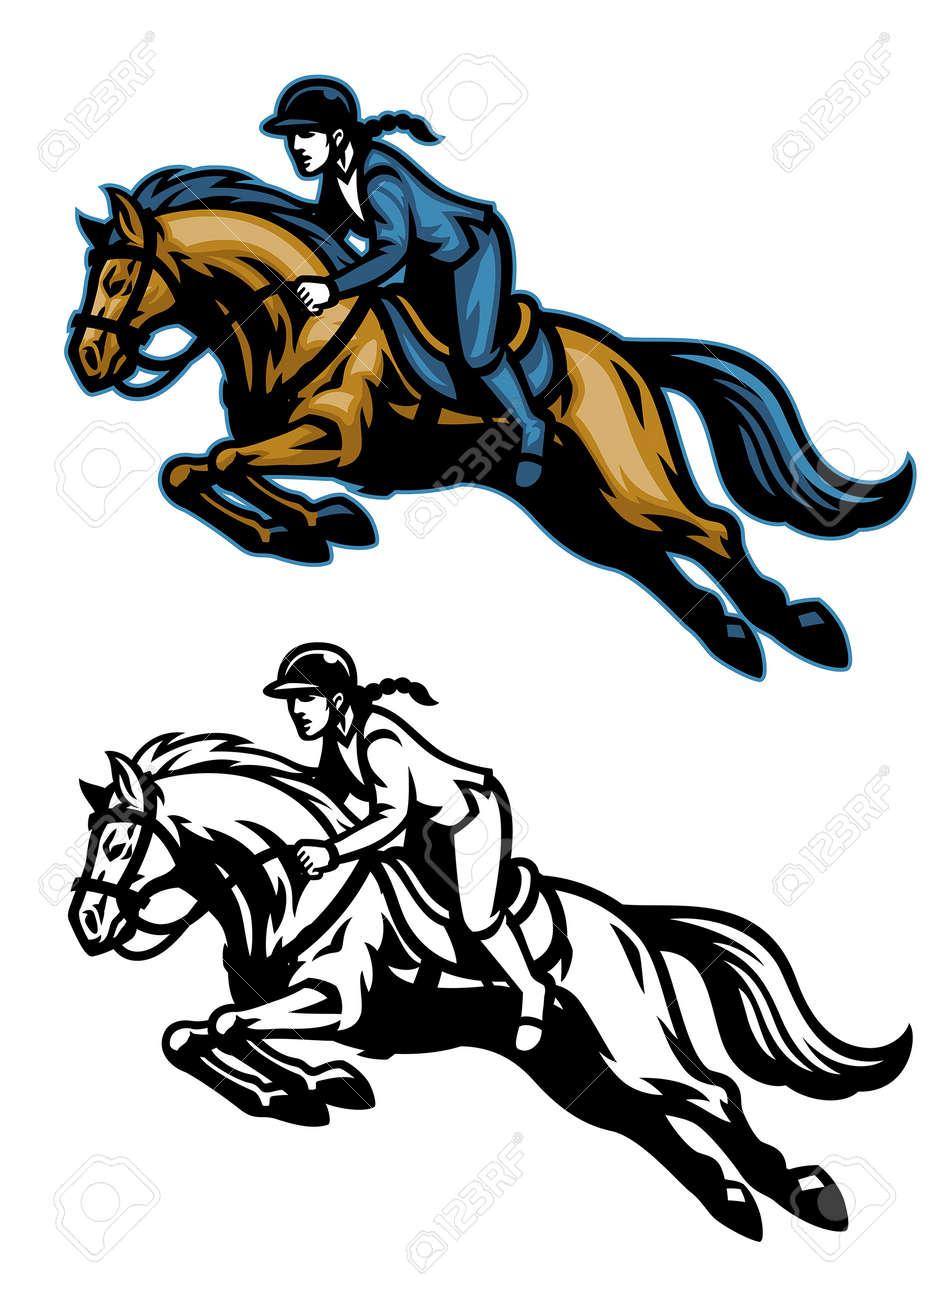 vector of running equestrian horse mascot - 165301306